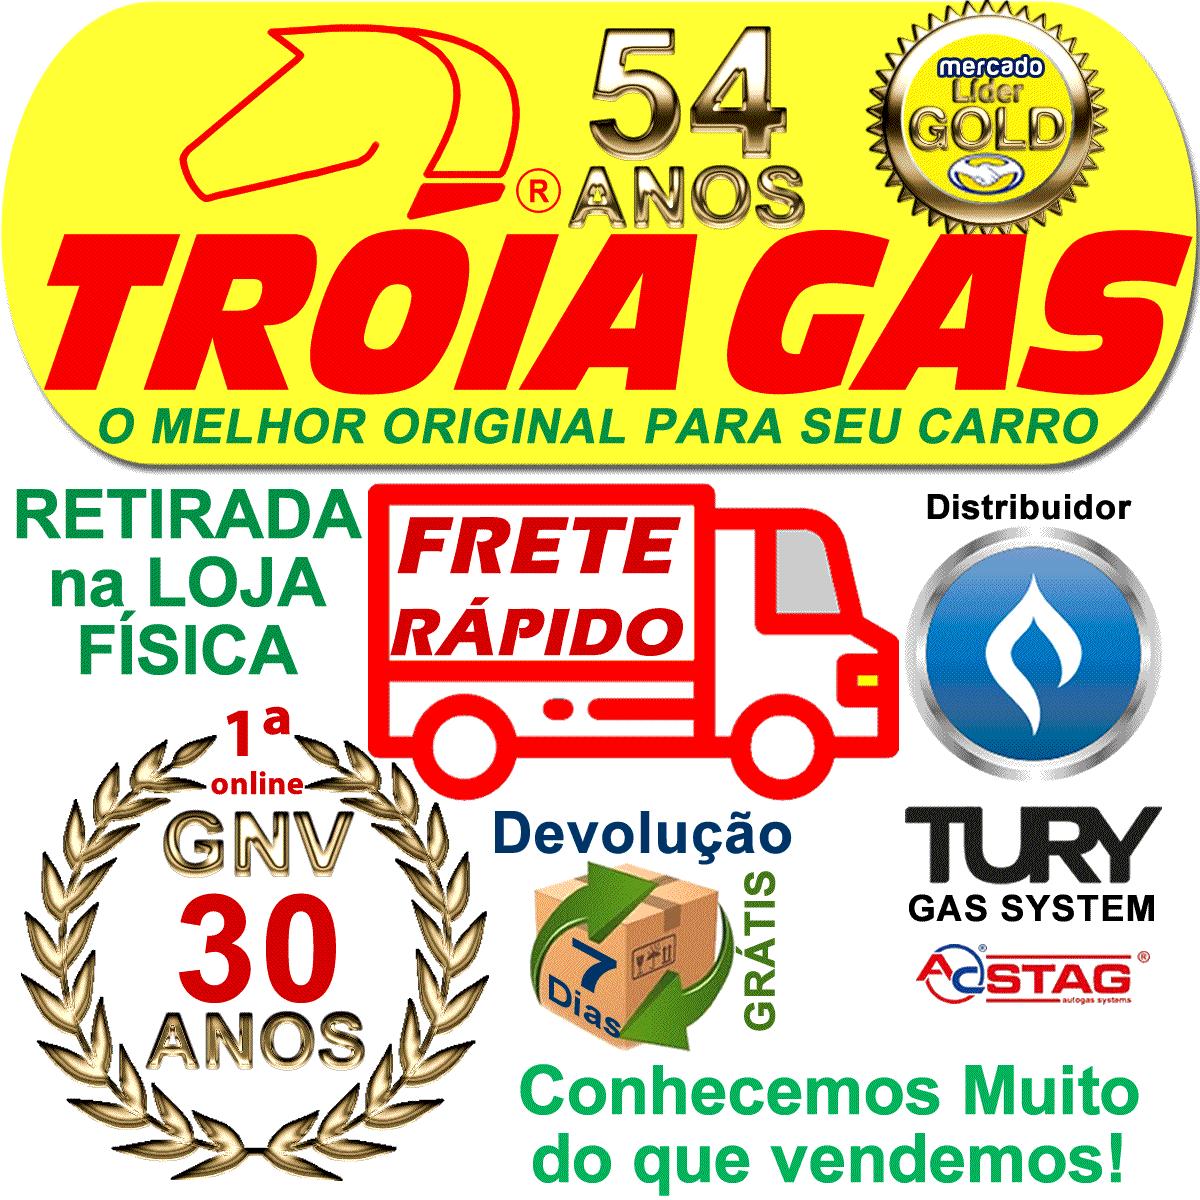 50m Perfil de Borracha para Cinta de Cilindros GNV